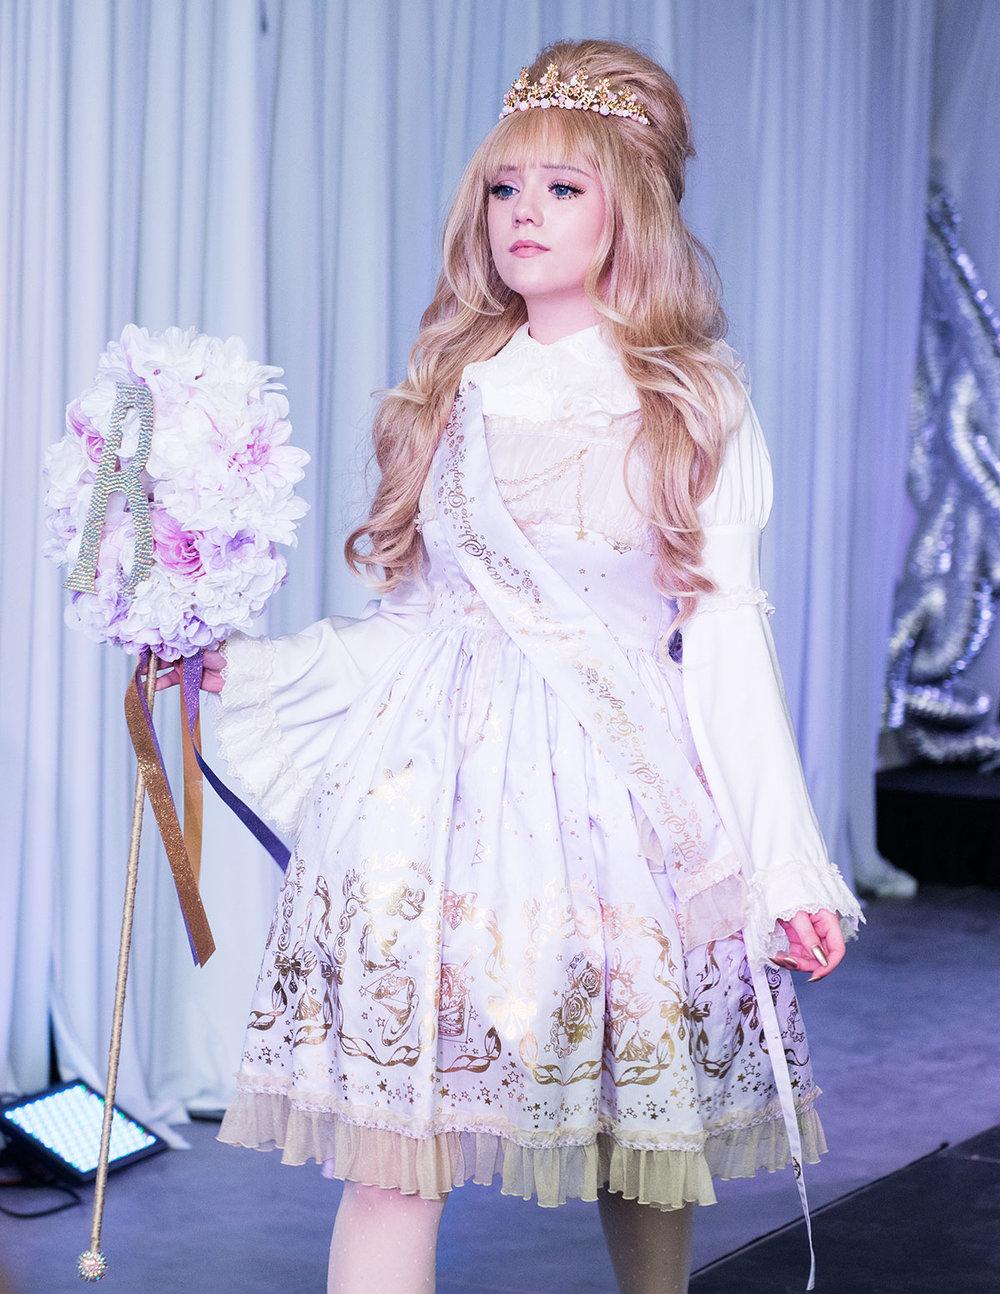 AMP_SewnSeeds_Lolita_12.jpg